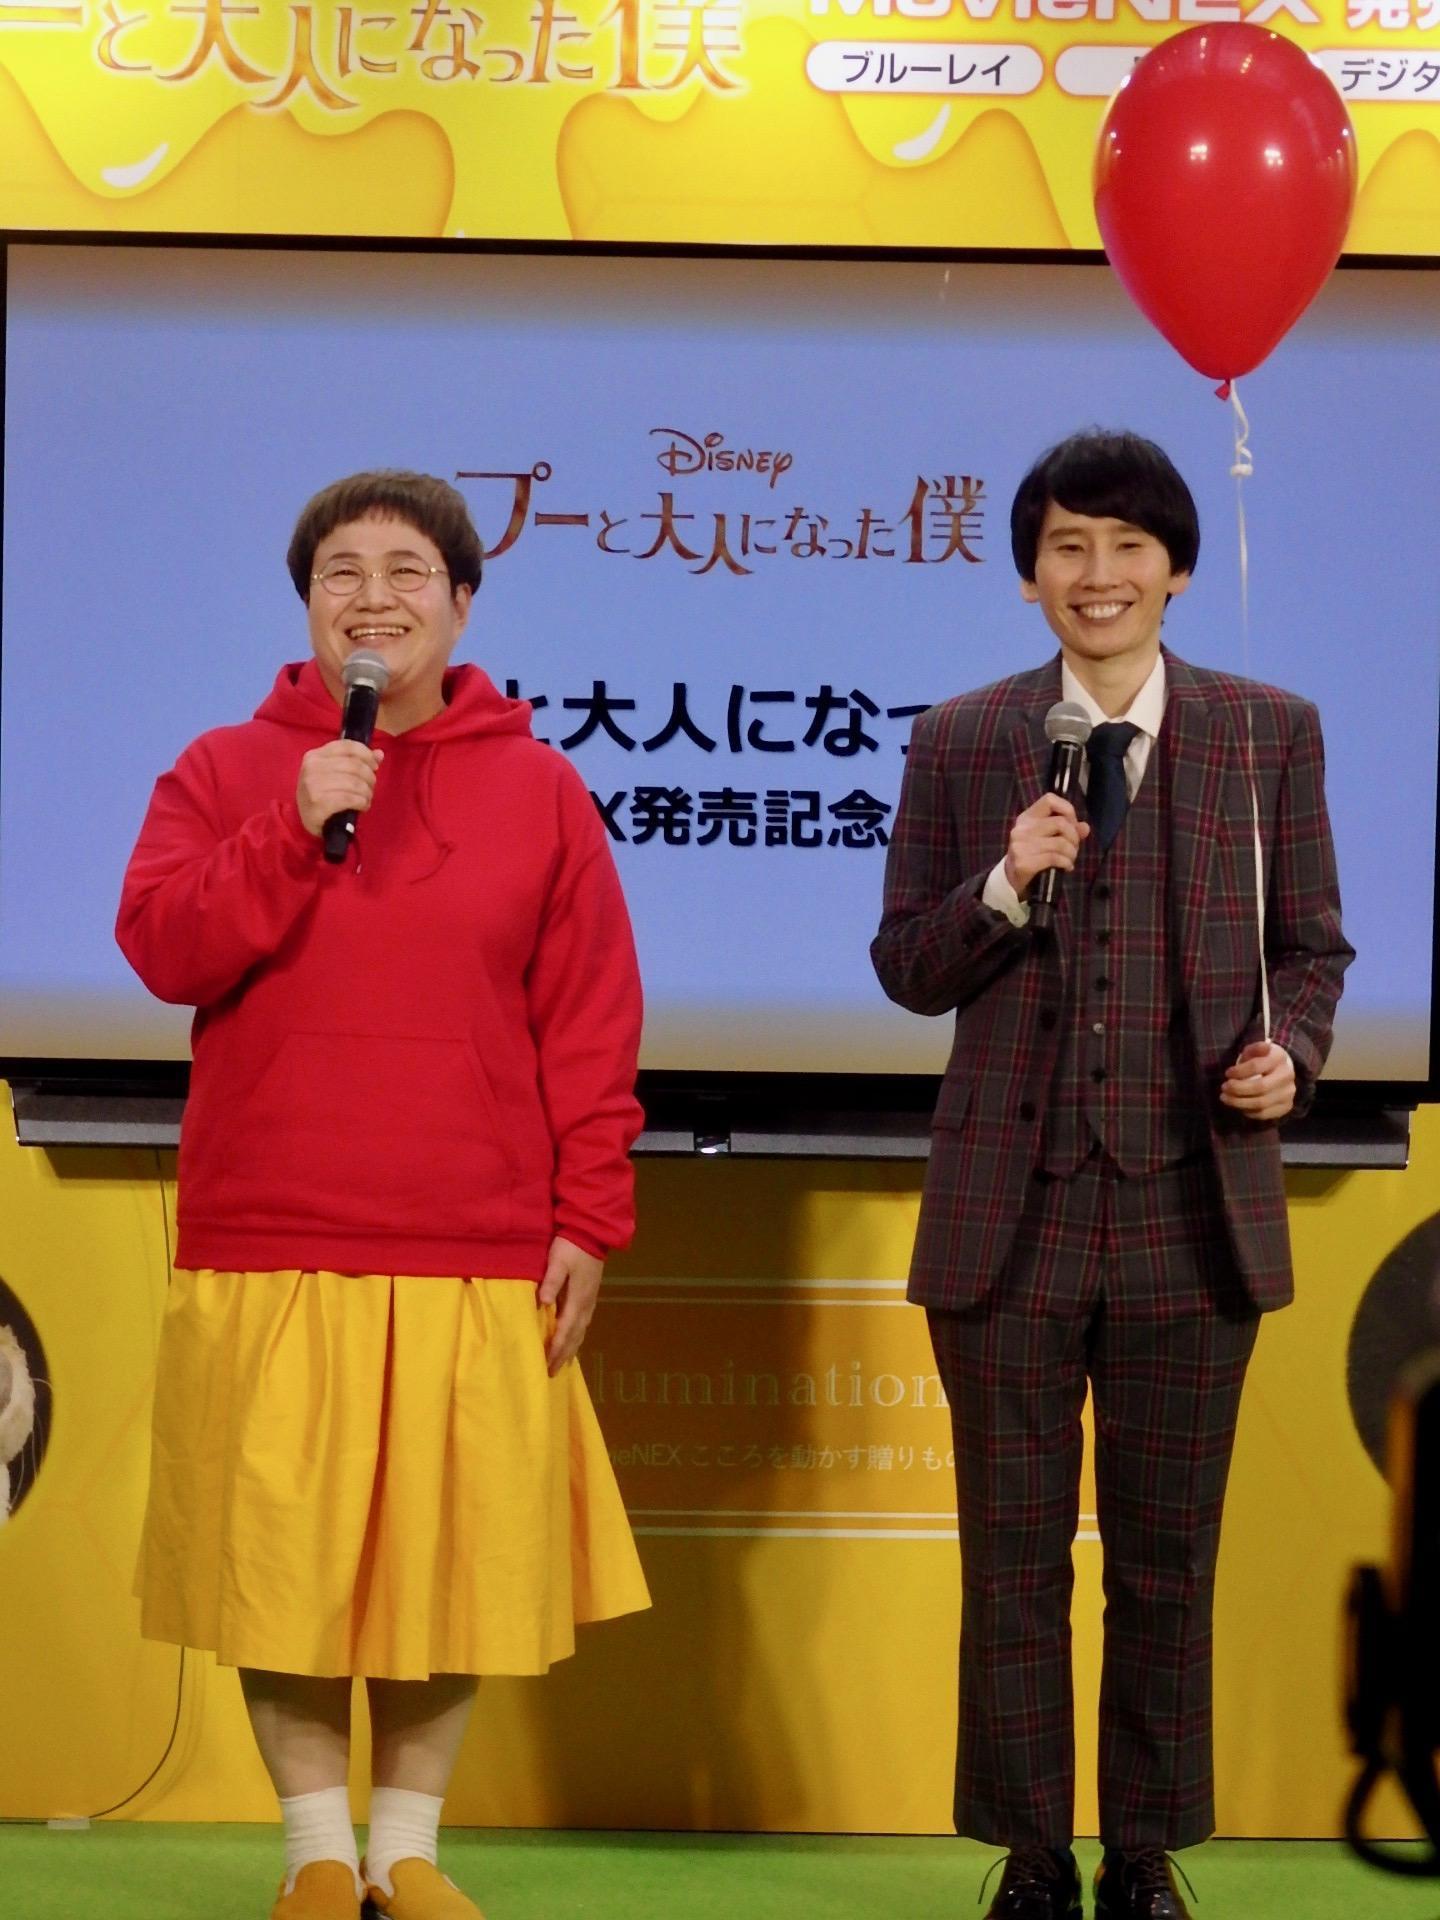 http://news.yoshimoto.co.jp/20181207005239-1890621dc19381eb2e6a05763ad9241e6e8326d6.jpeg